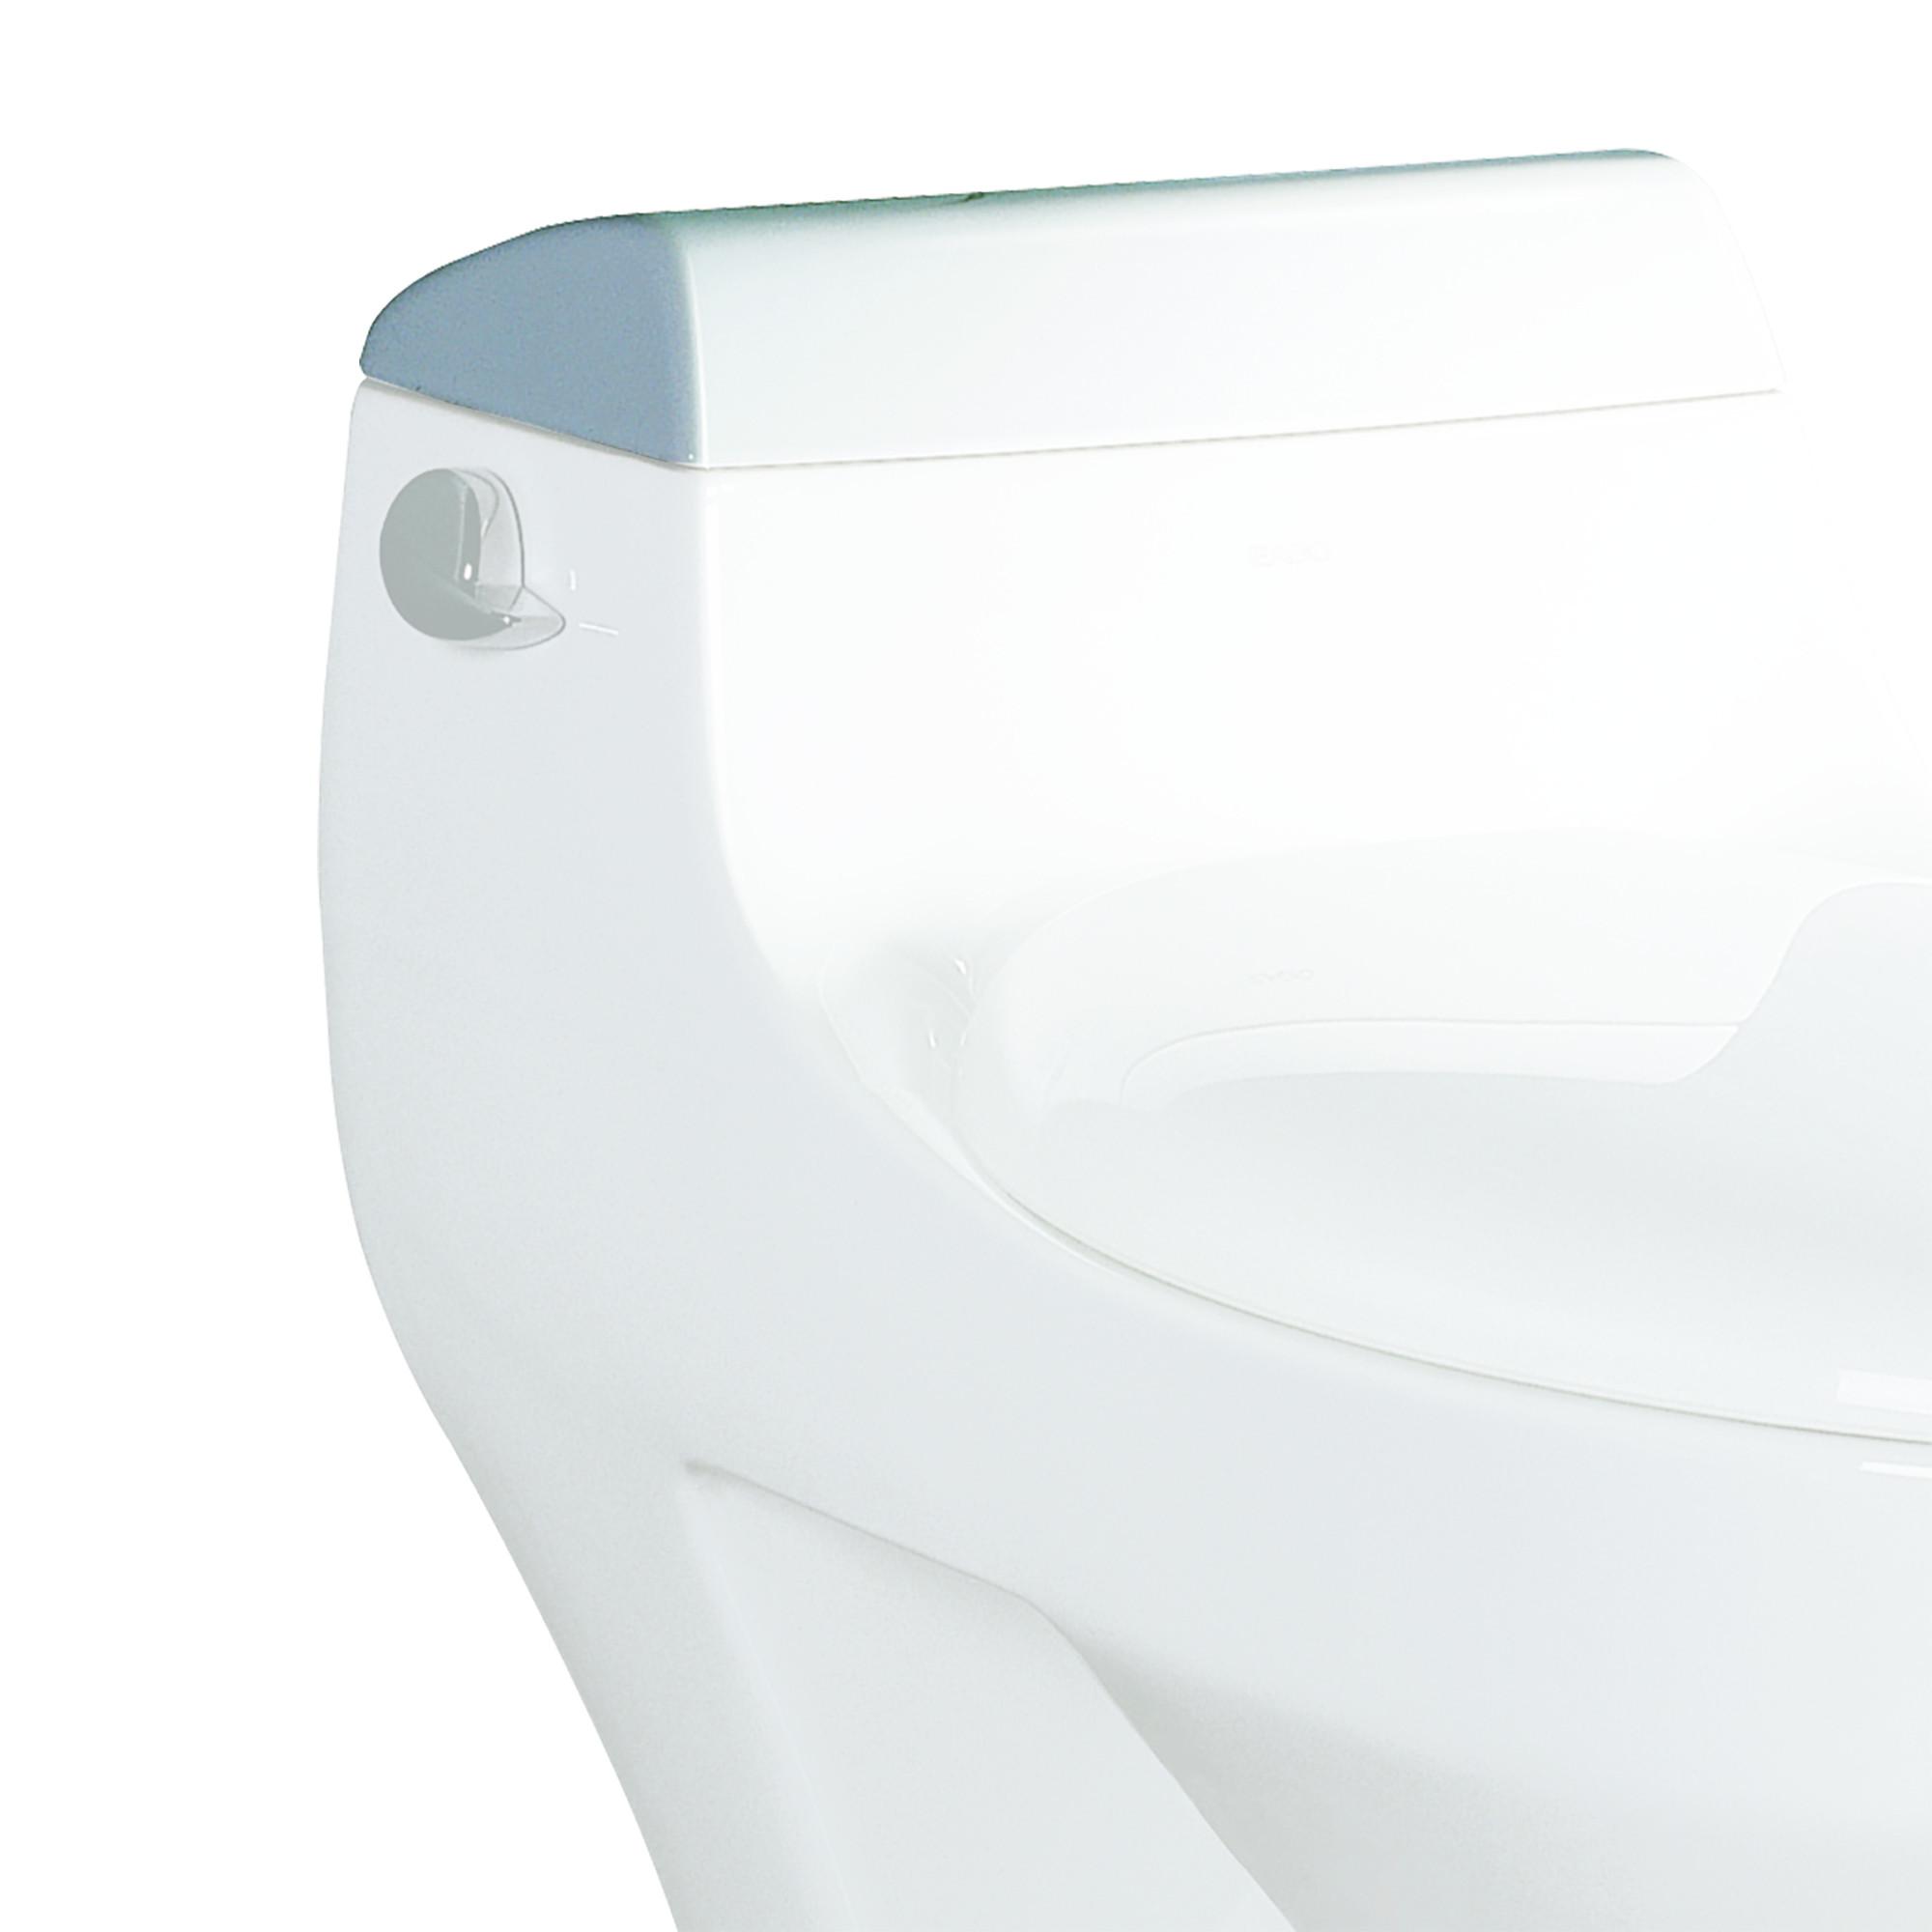 EAGO R-108LID Replacement Ceramic Toilet Lid for TB108